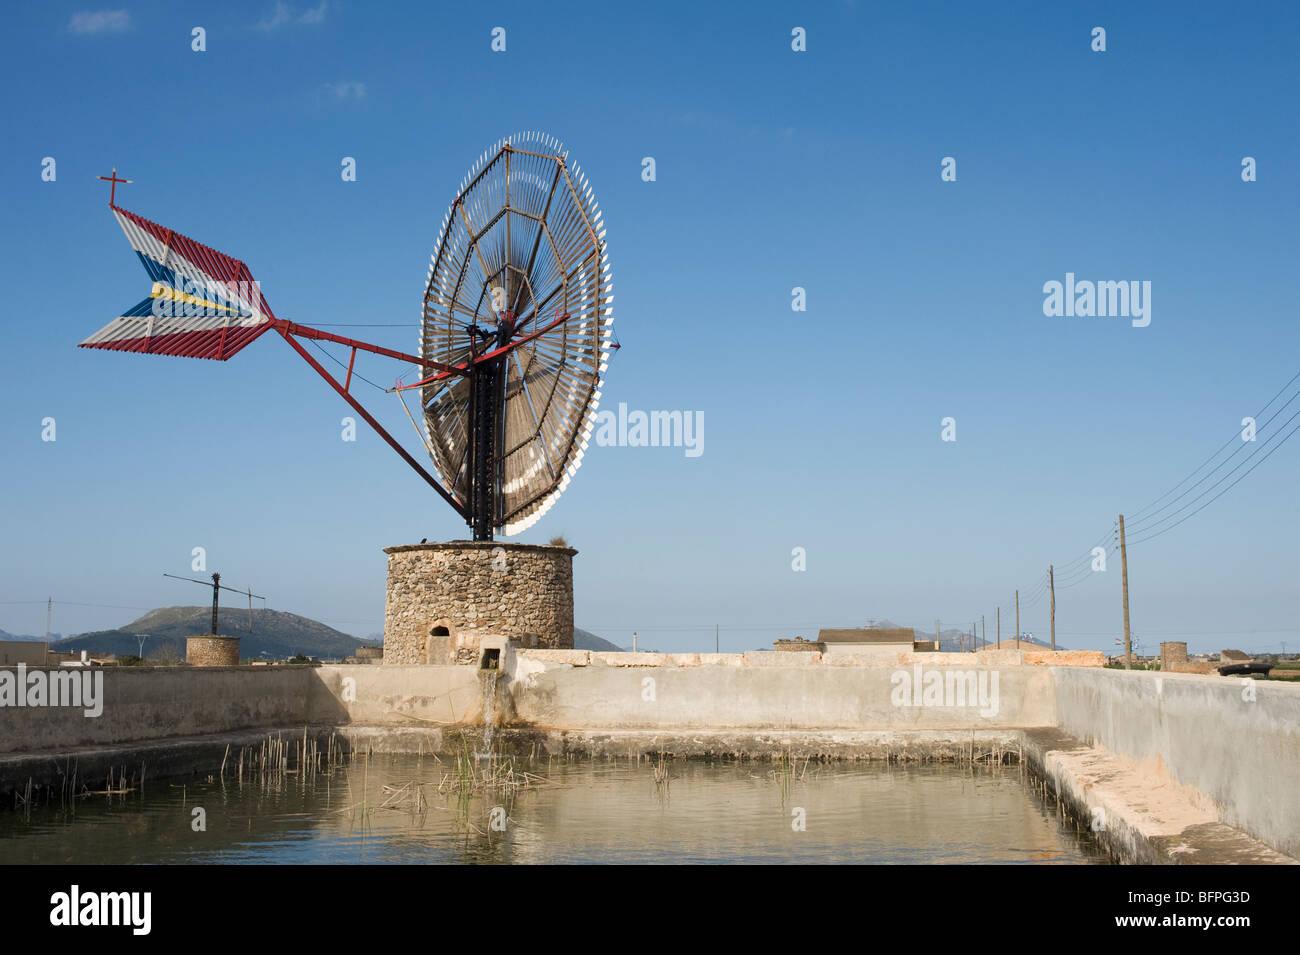 Irrigation windmill on a farm in Mallorca, Majorca, Spain Stock Photo